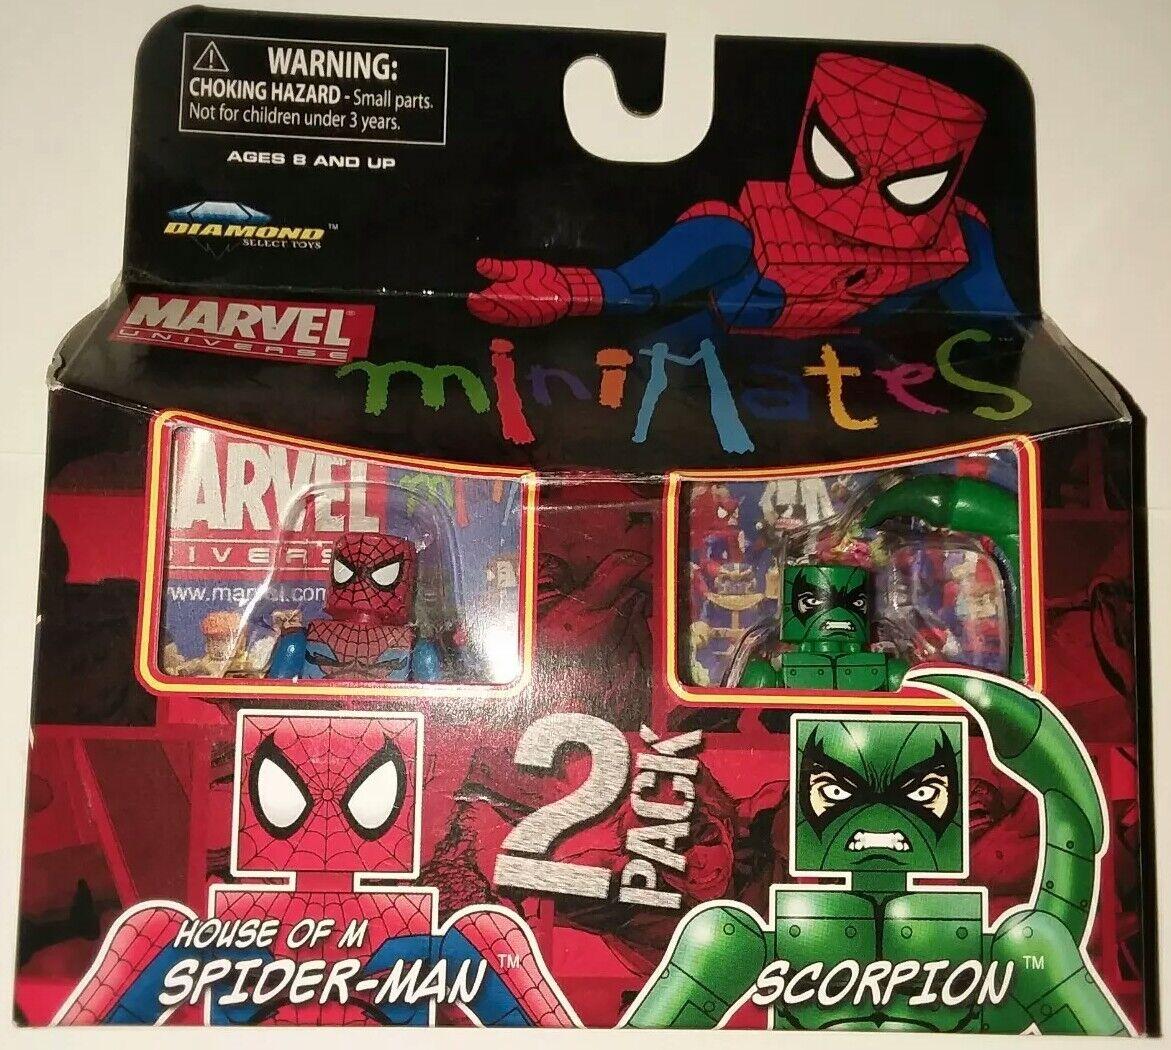 Minimates MARVEL HTF     HOUSE OF M SPIDER-MAN and SCORPION  b1b845